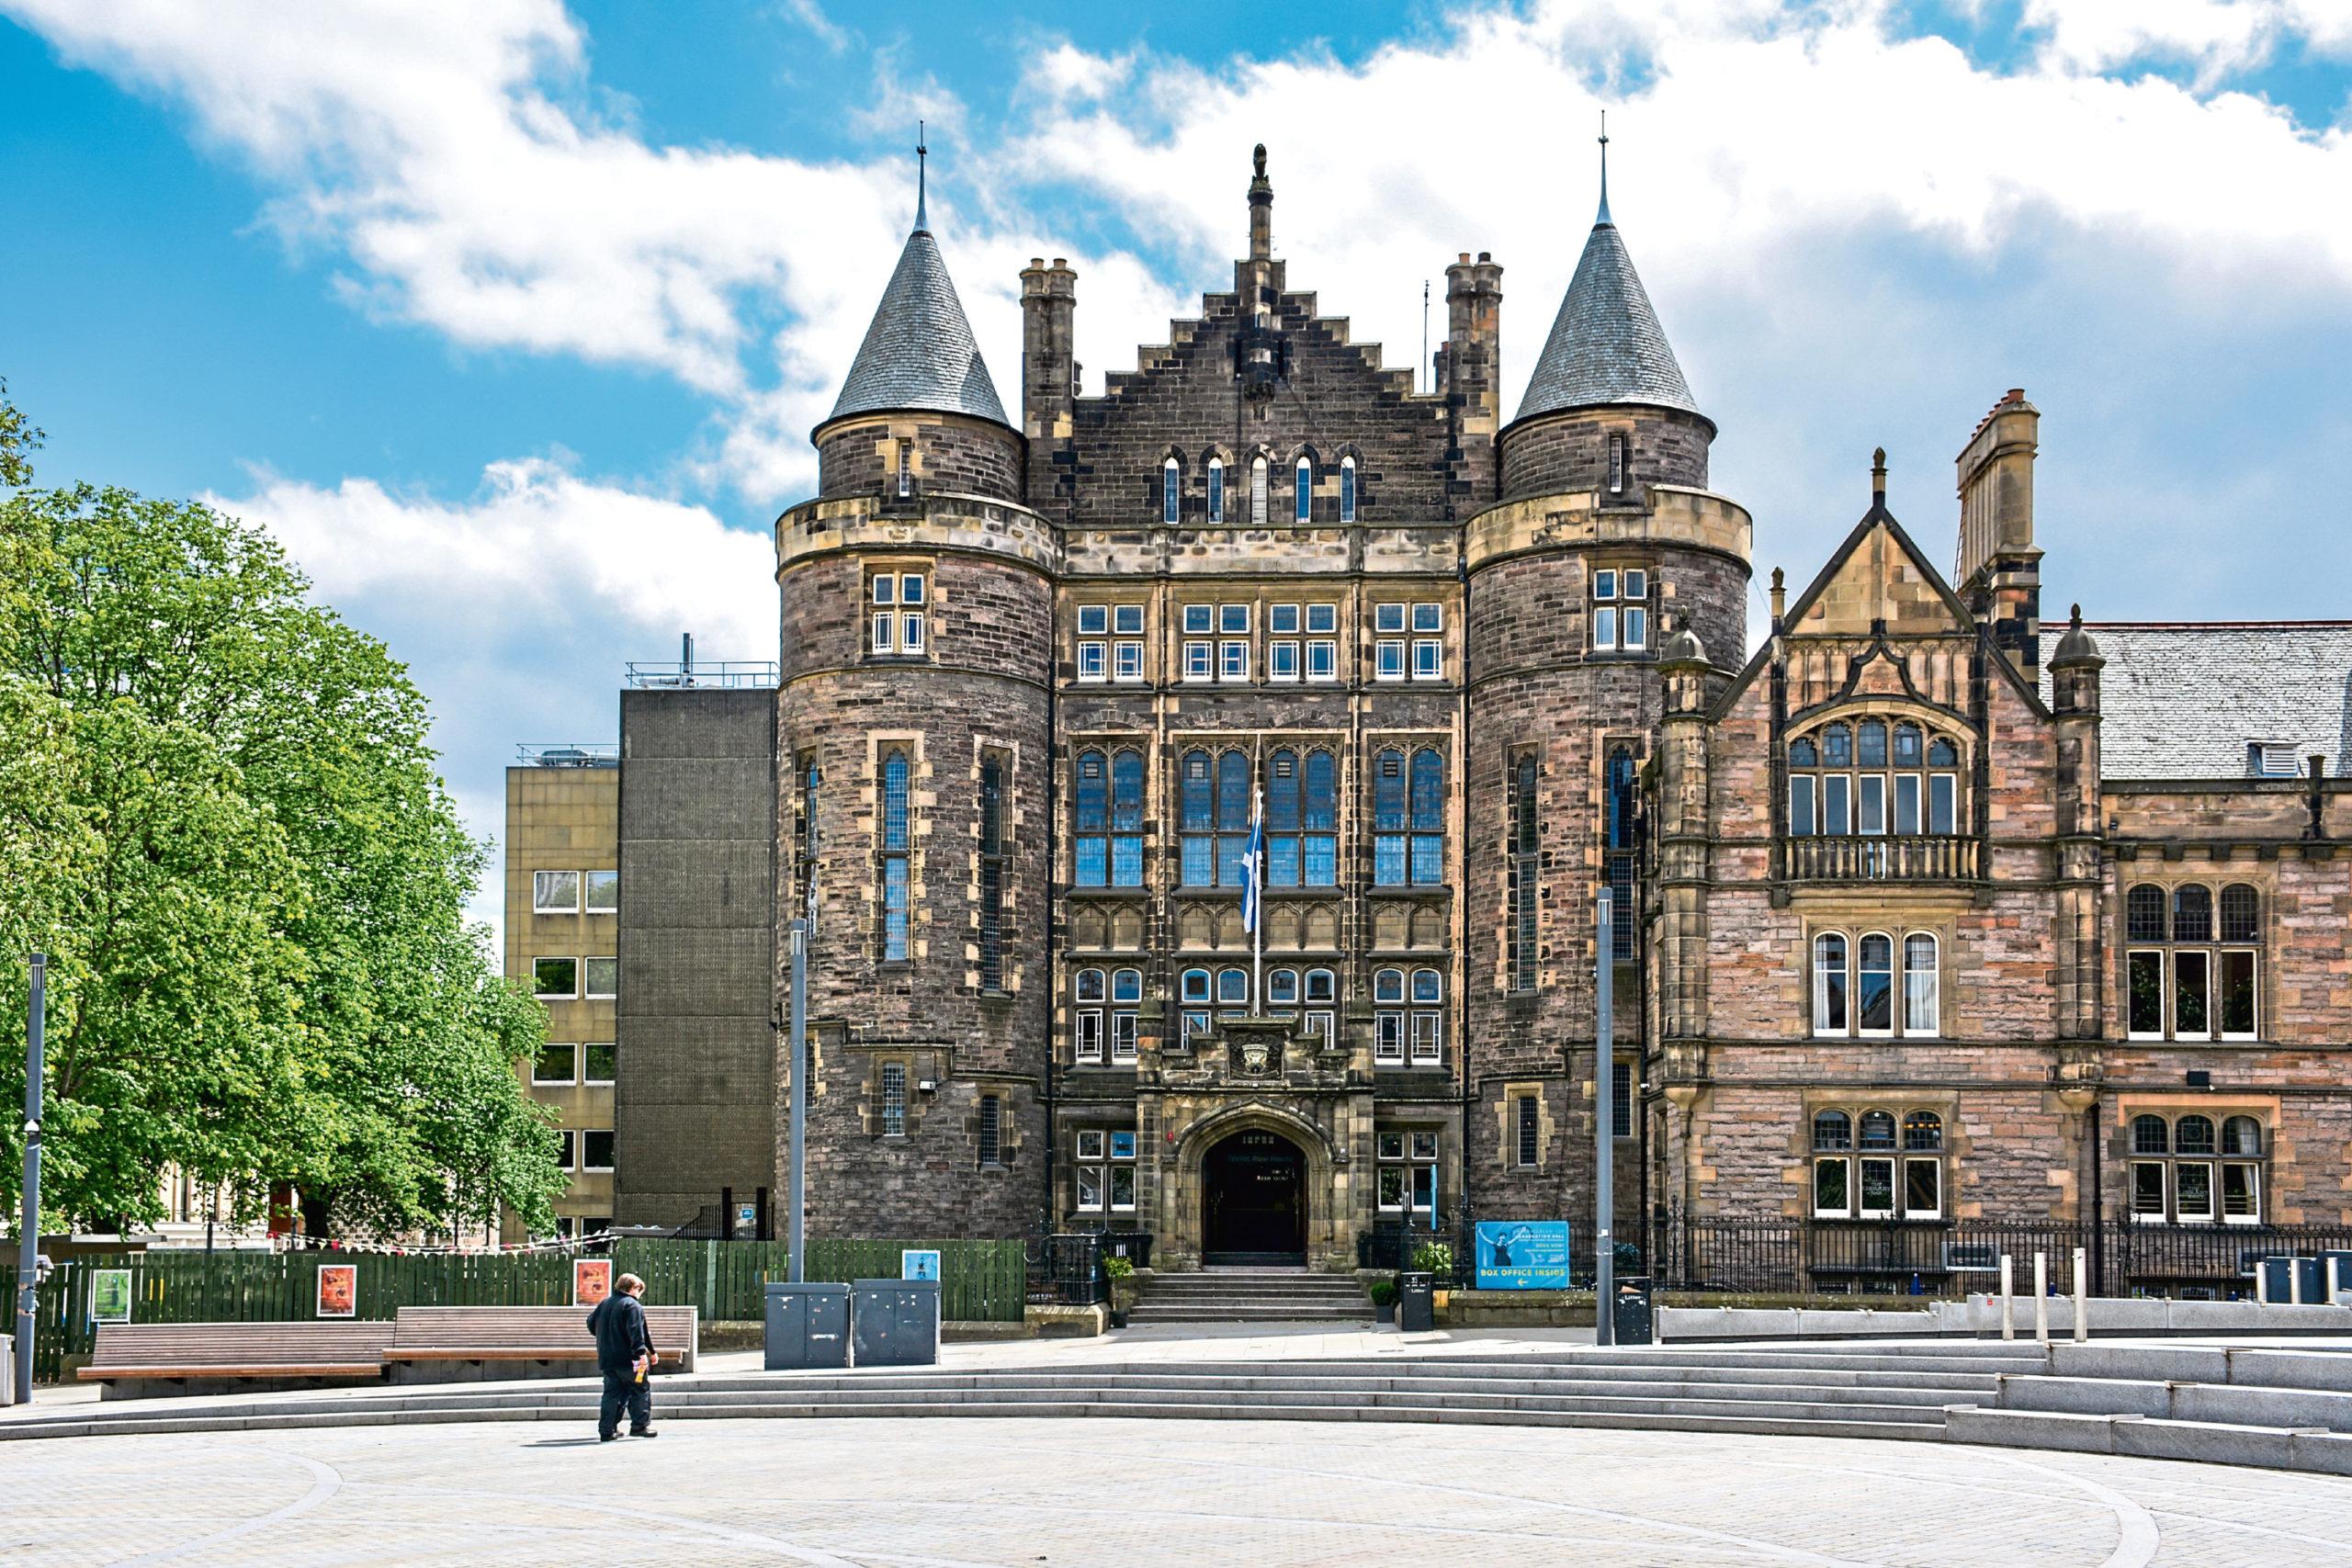 Teviot Row House, a student union building at Edinburgh University.